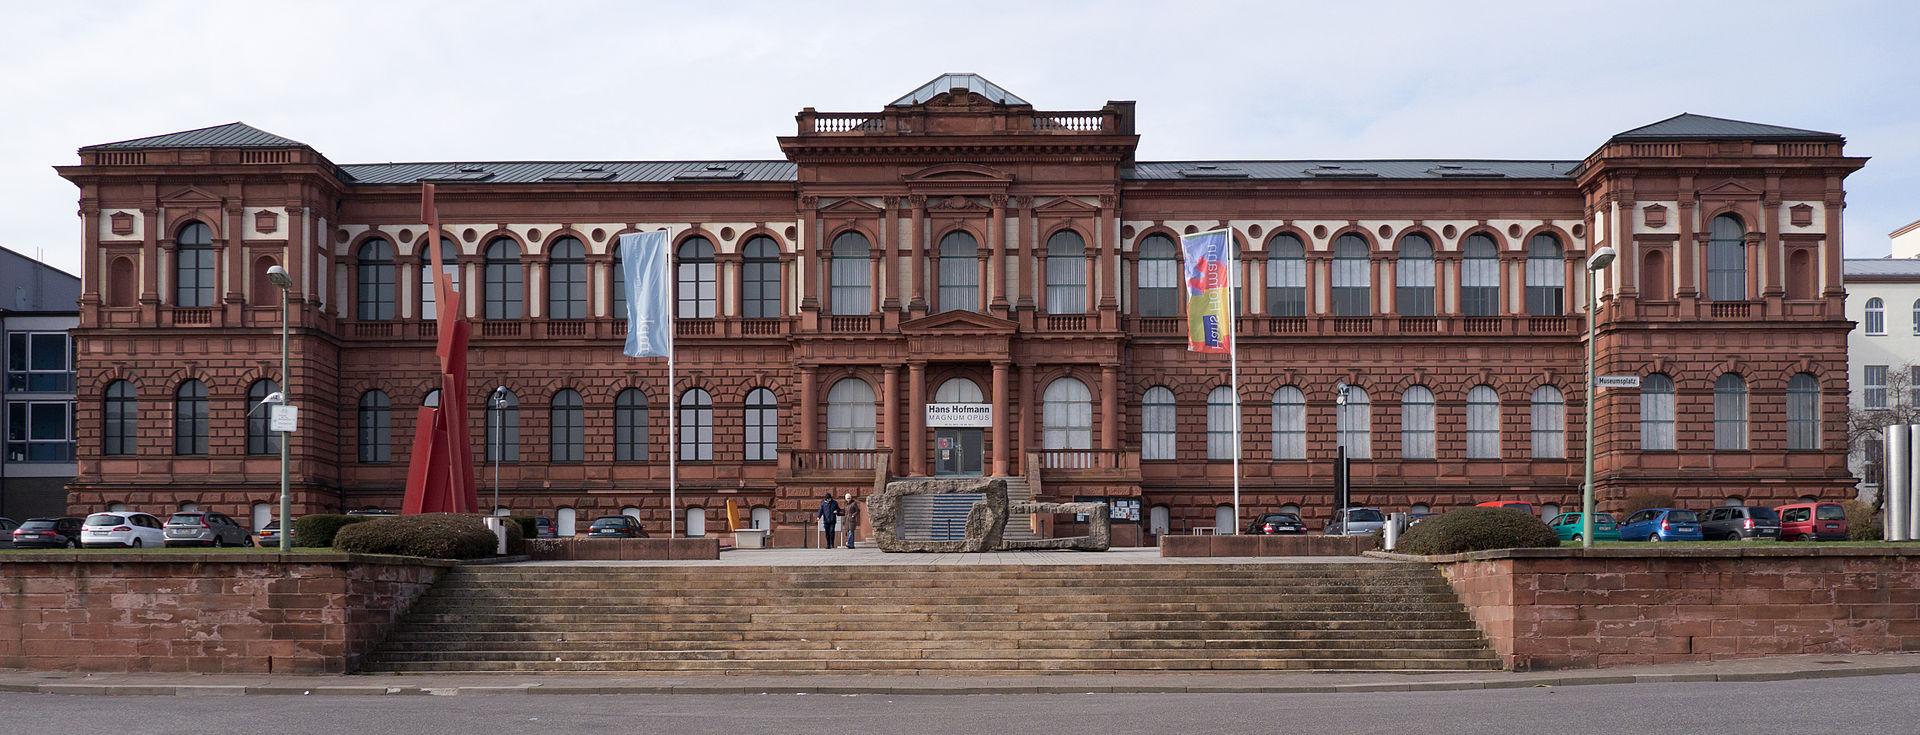 Bild Museum Pfalzgalerie Kaiserslautern